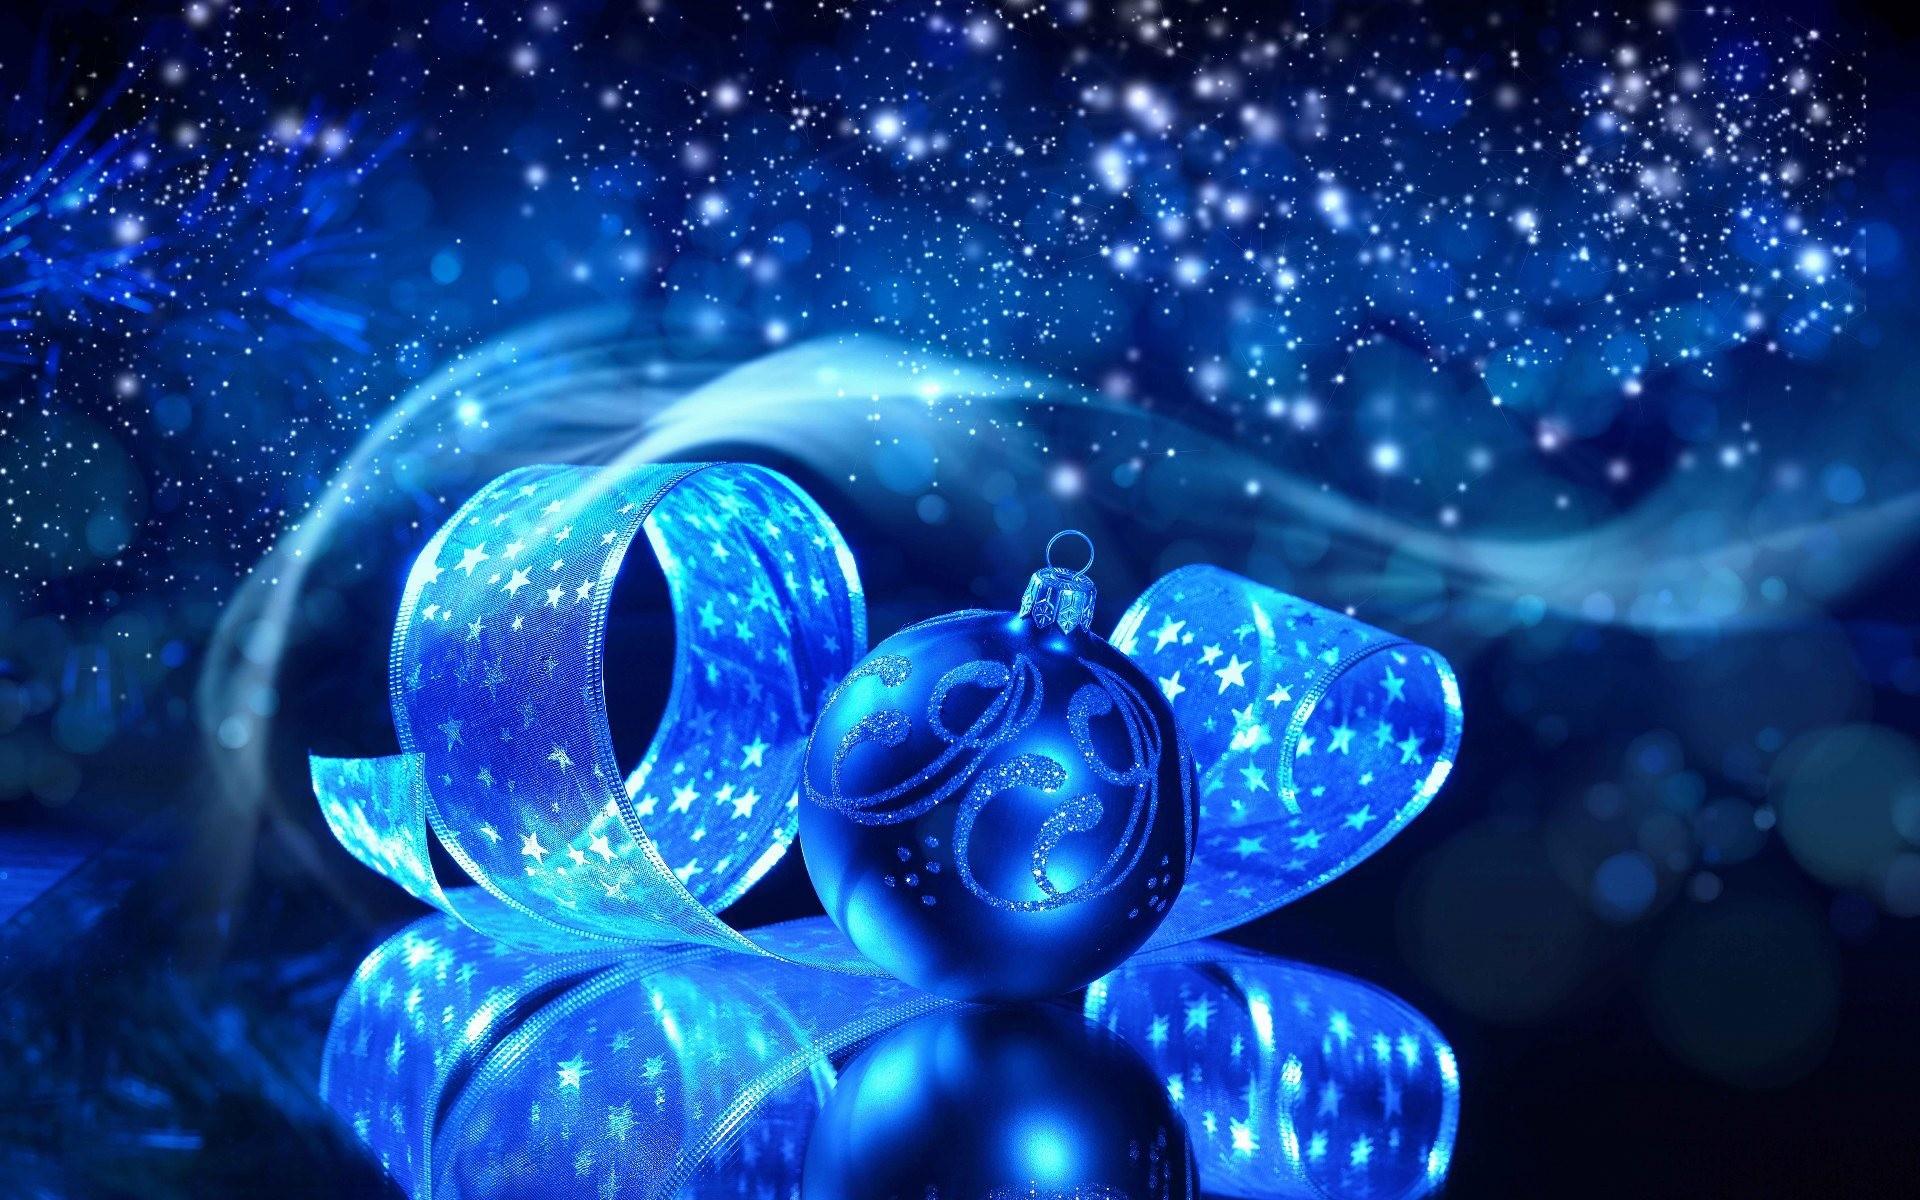 Blue Christmas Background Widescreen.